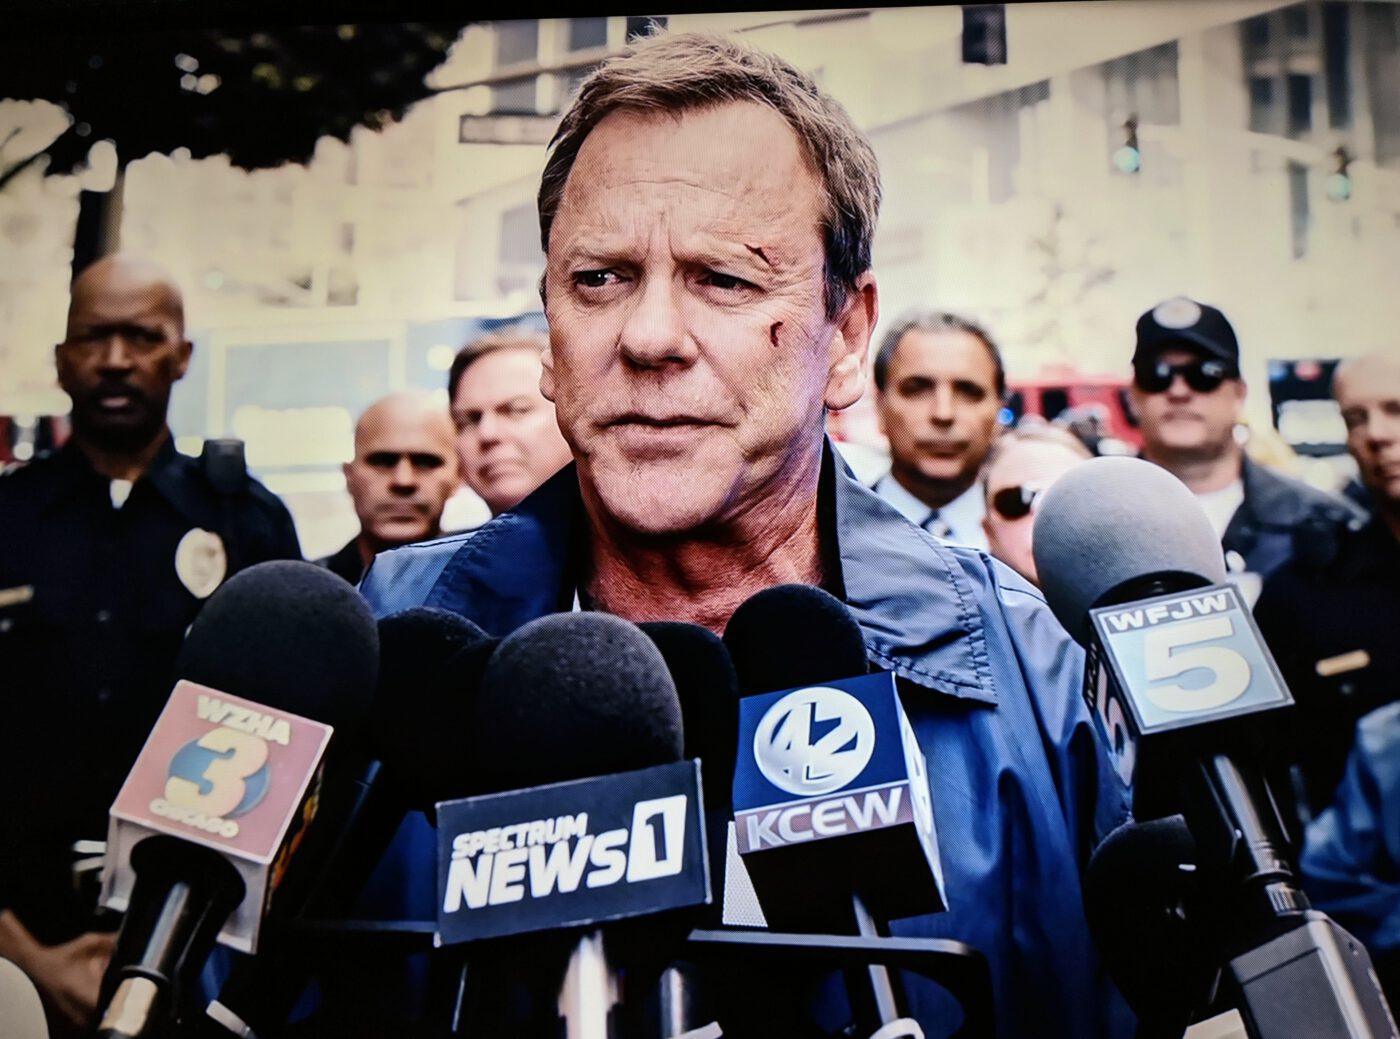 Kiefer Sutherland in The Fugitive